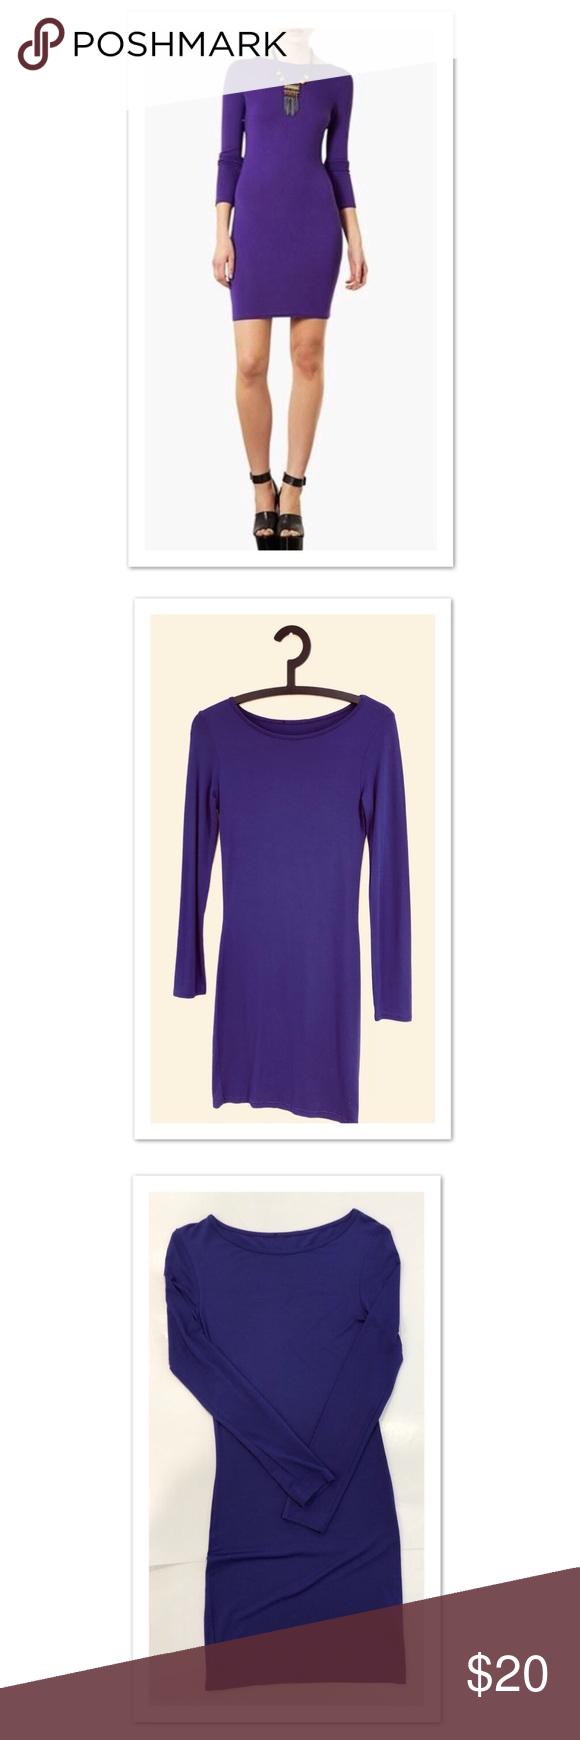 Topshop long sleeve purple bodycon tshirt dress in my posh